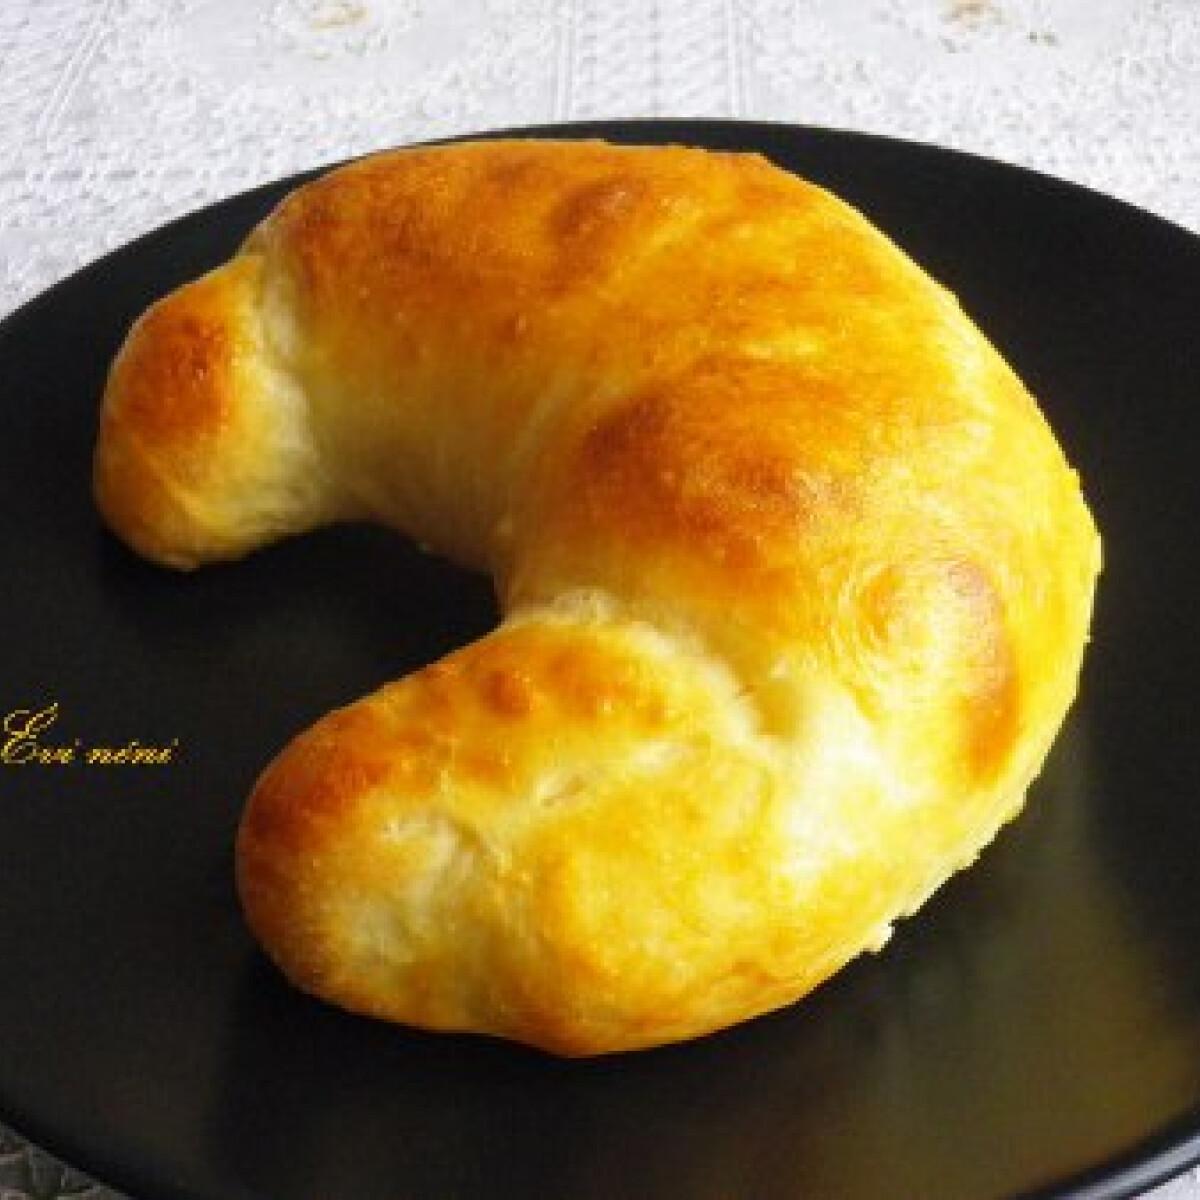 Írós-krumplis kifli thang zonggal